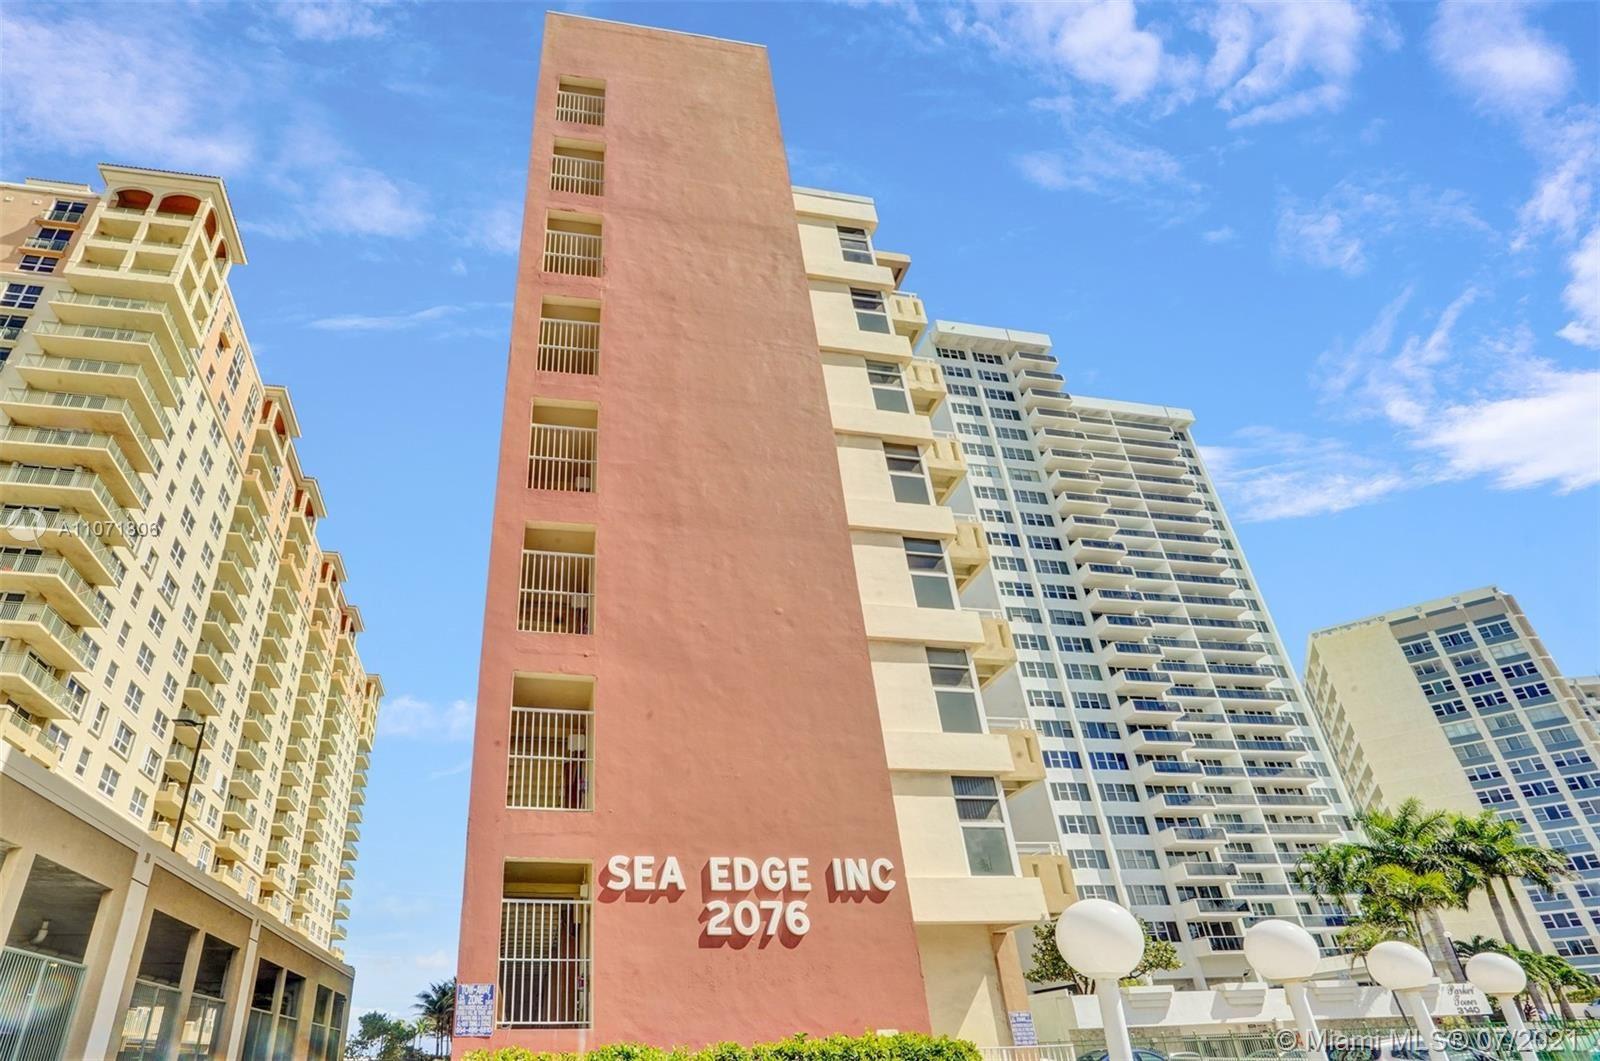 Photo of 2076 S Ocean Dr #612, Hallandale Beach, FL 33009 (MLS # A11071806)